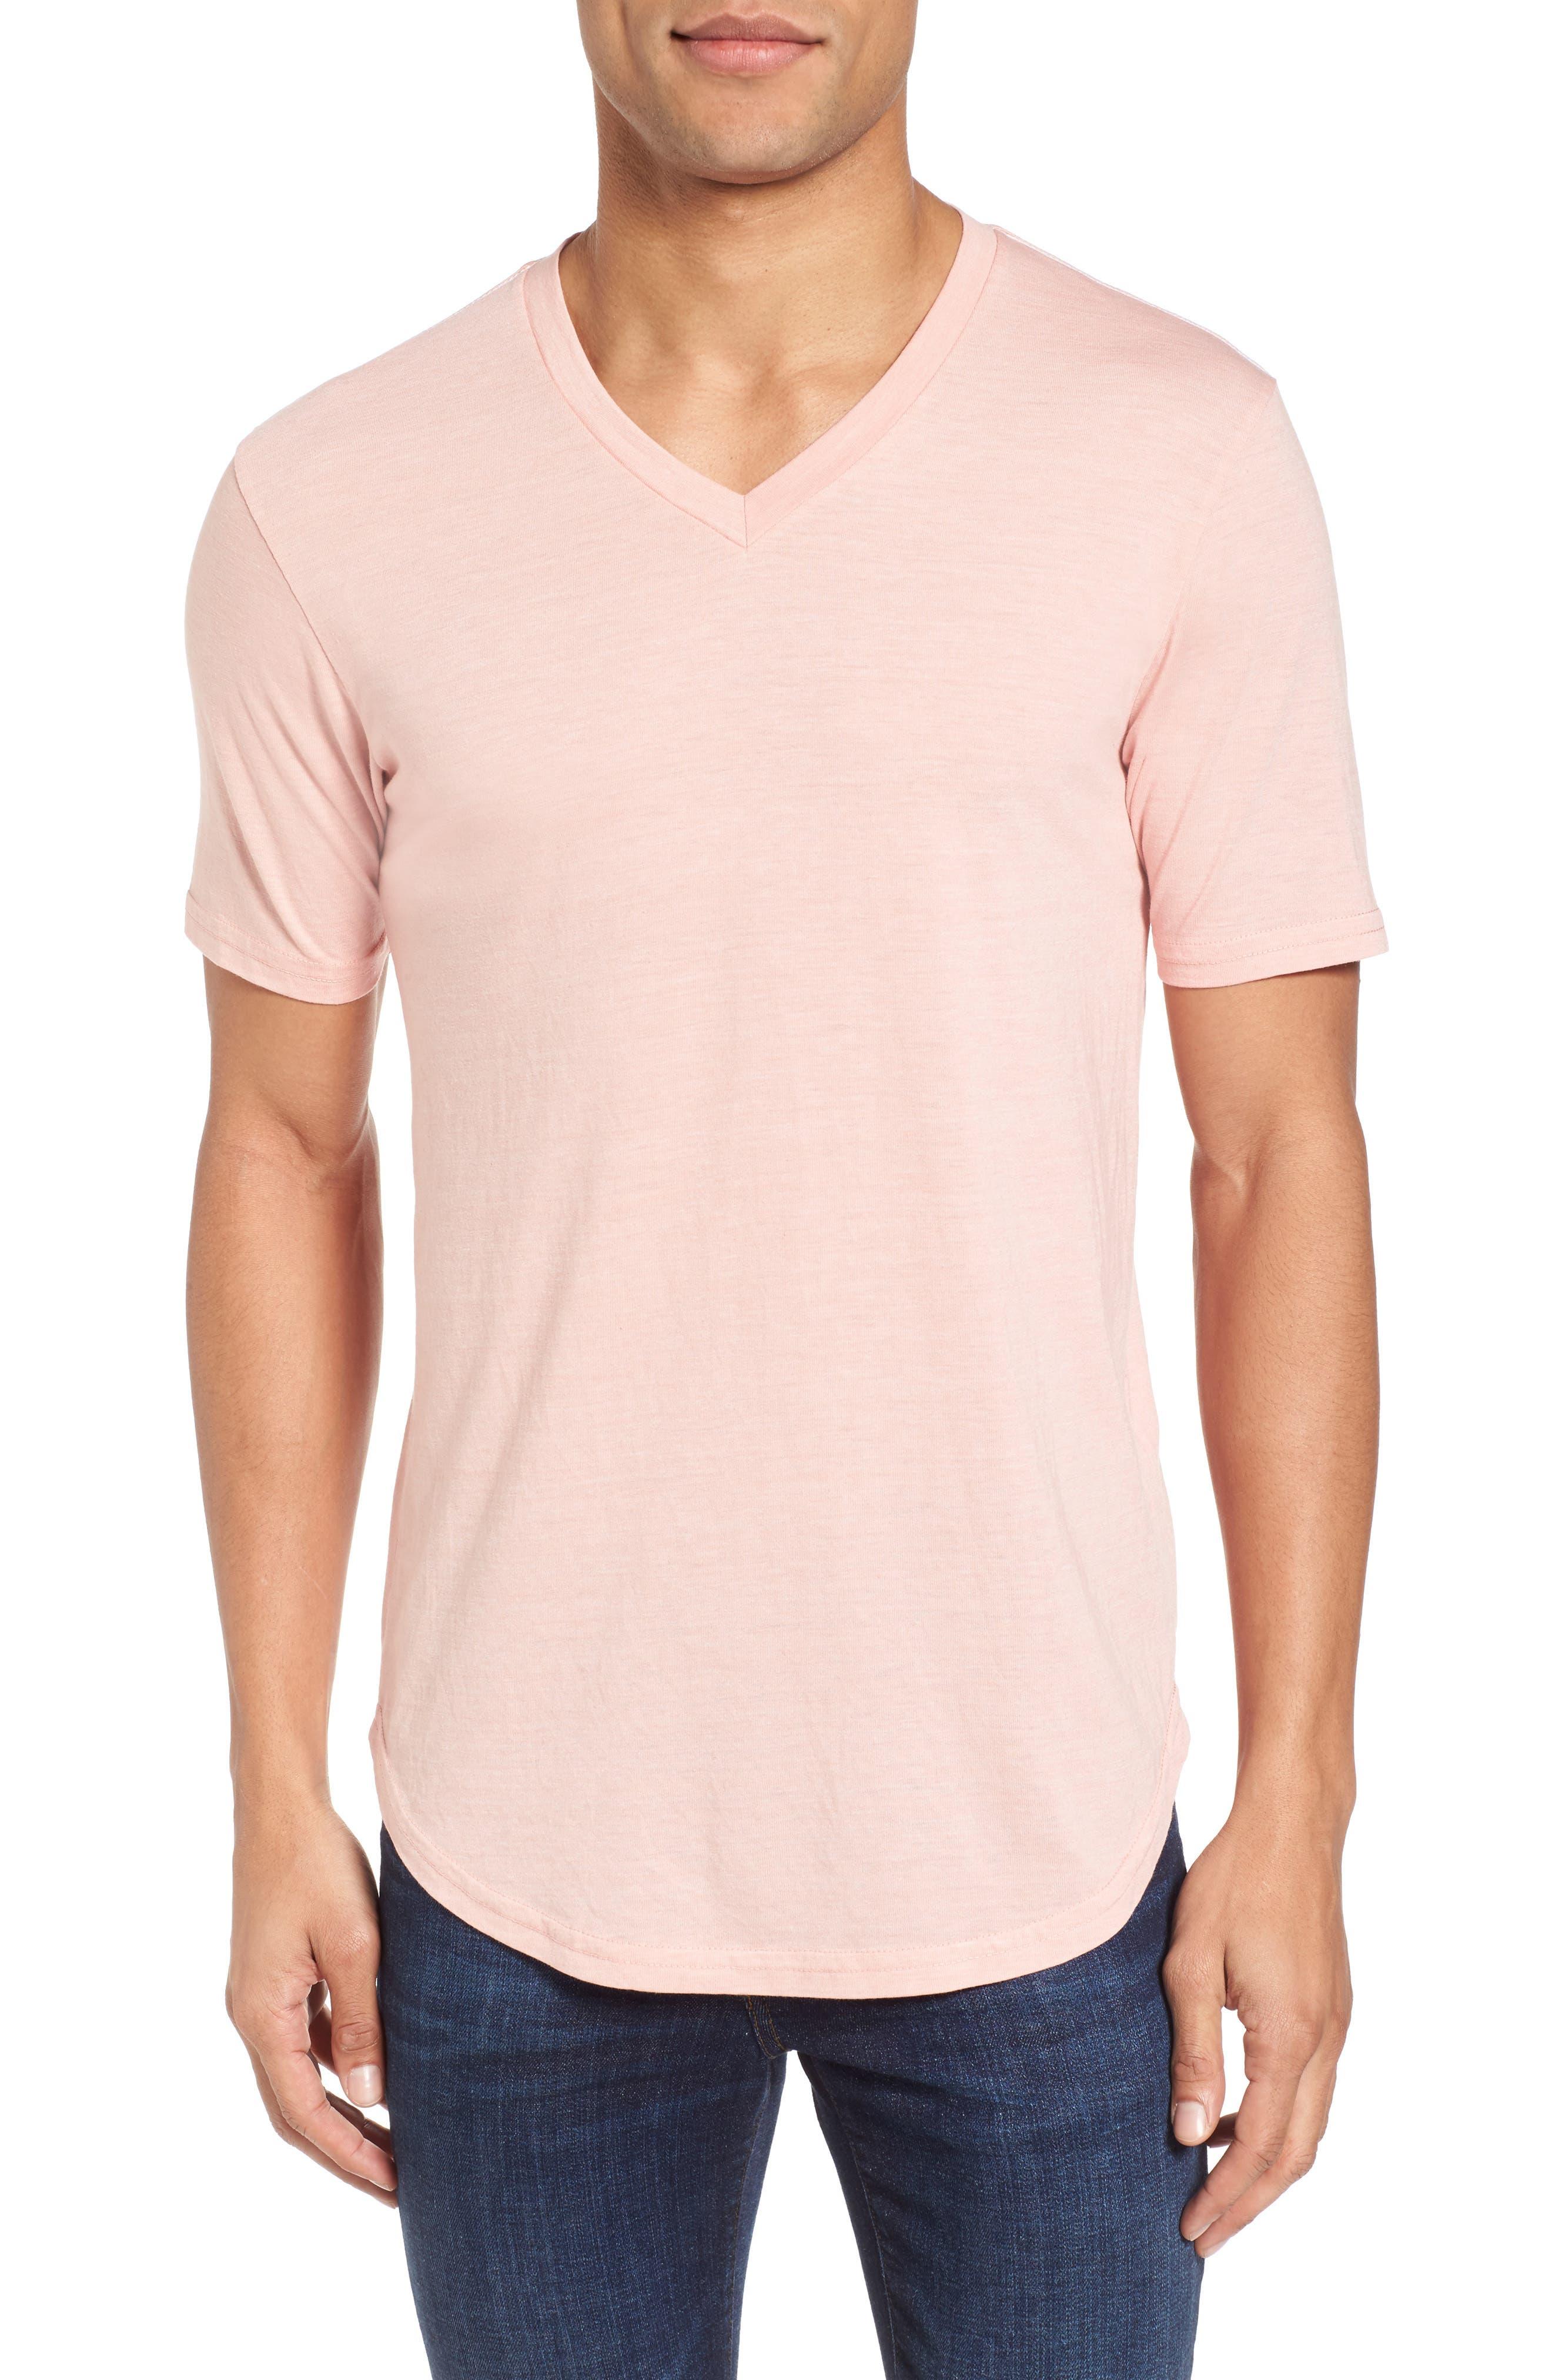 Goodlife V-Neck T-Shirt